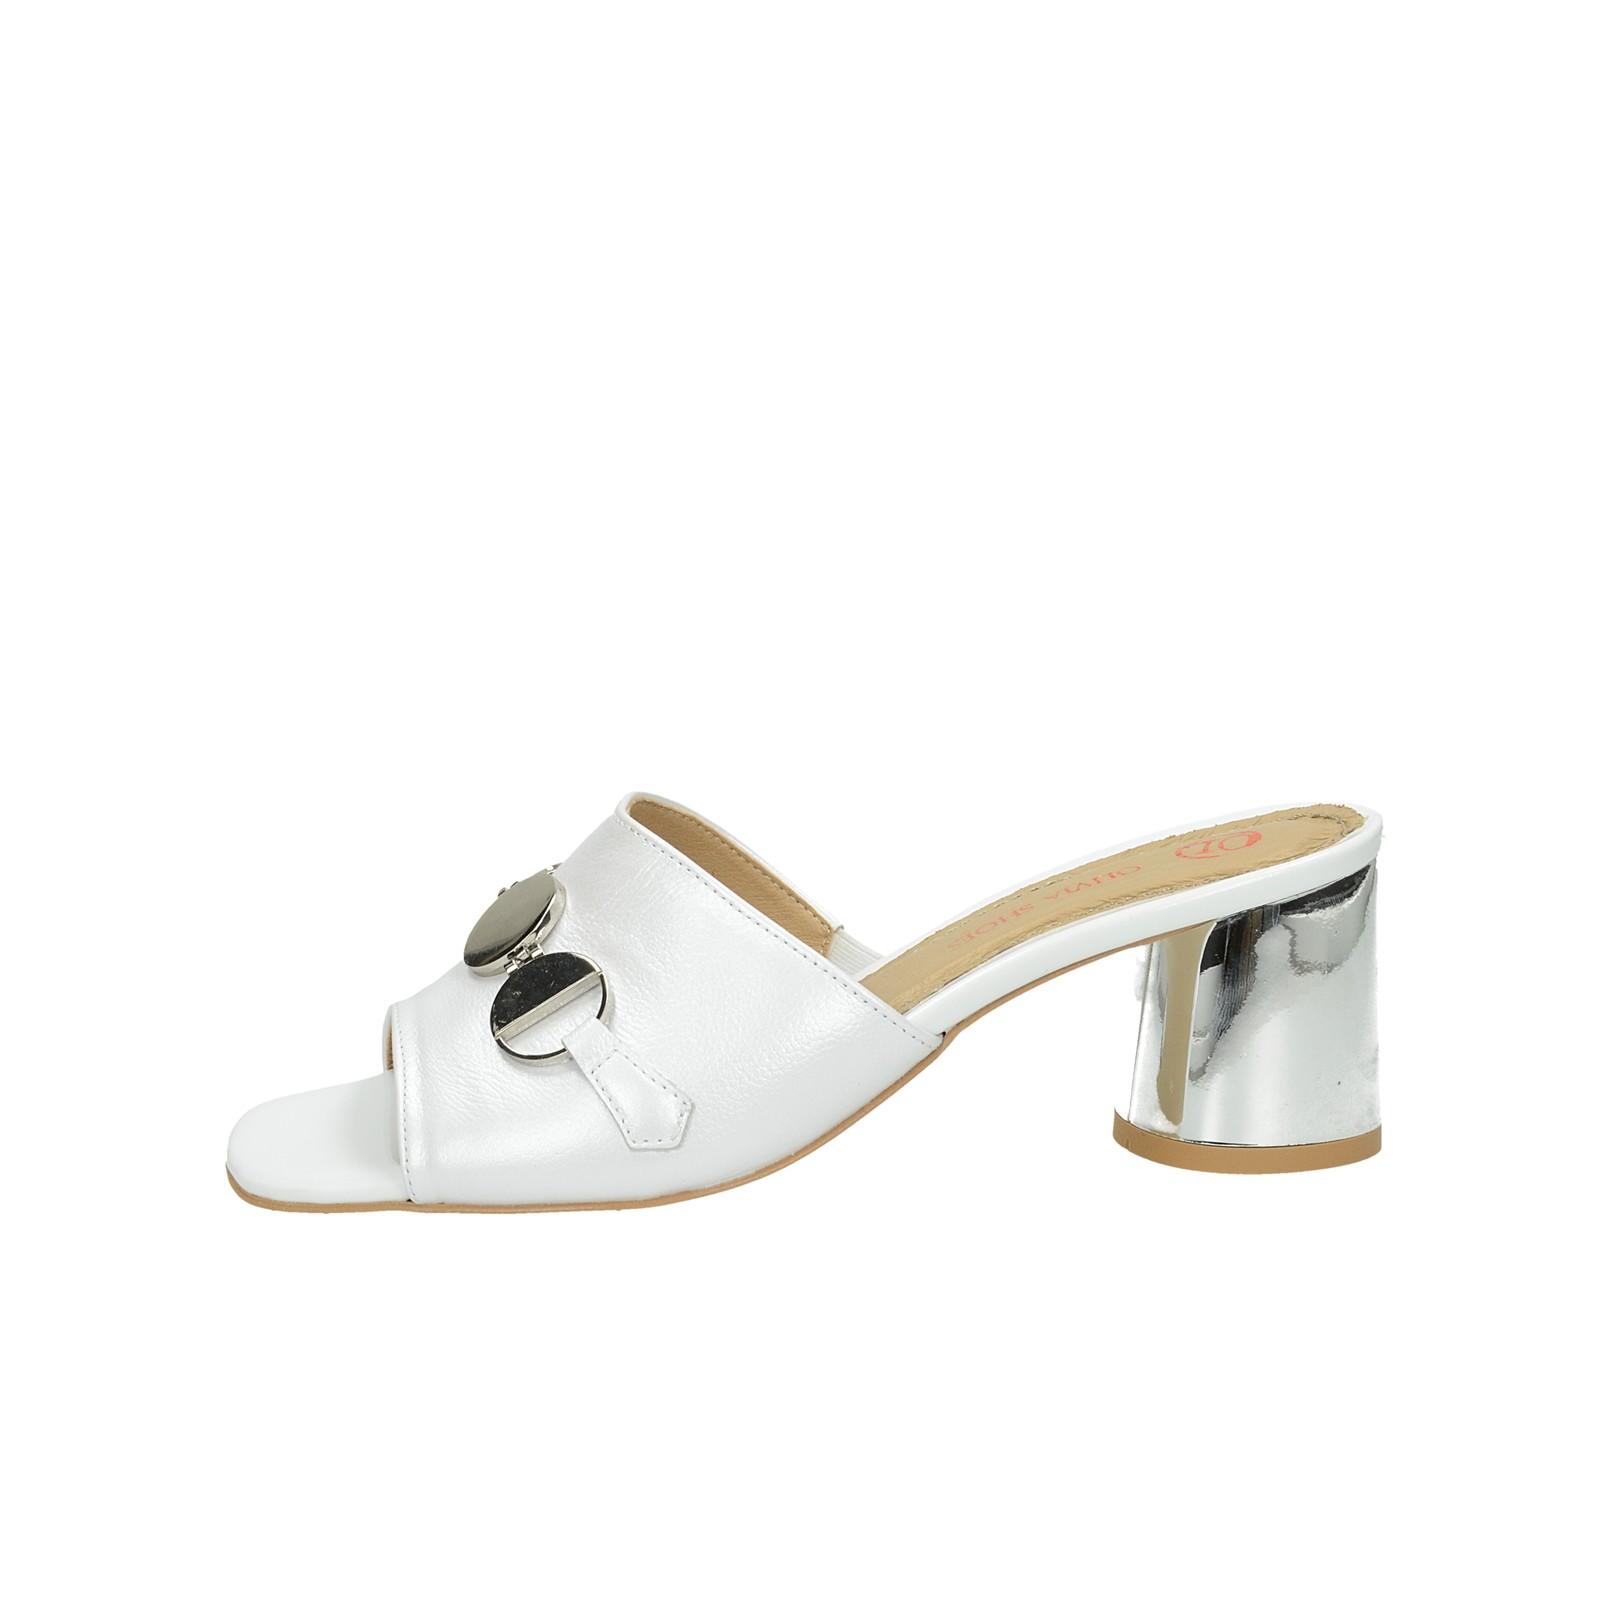 Olivia shoes dámske štýlové šľapky - biele